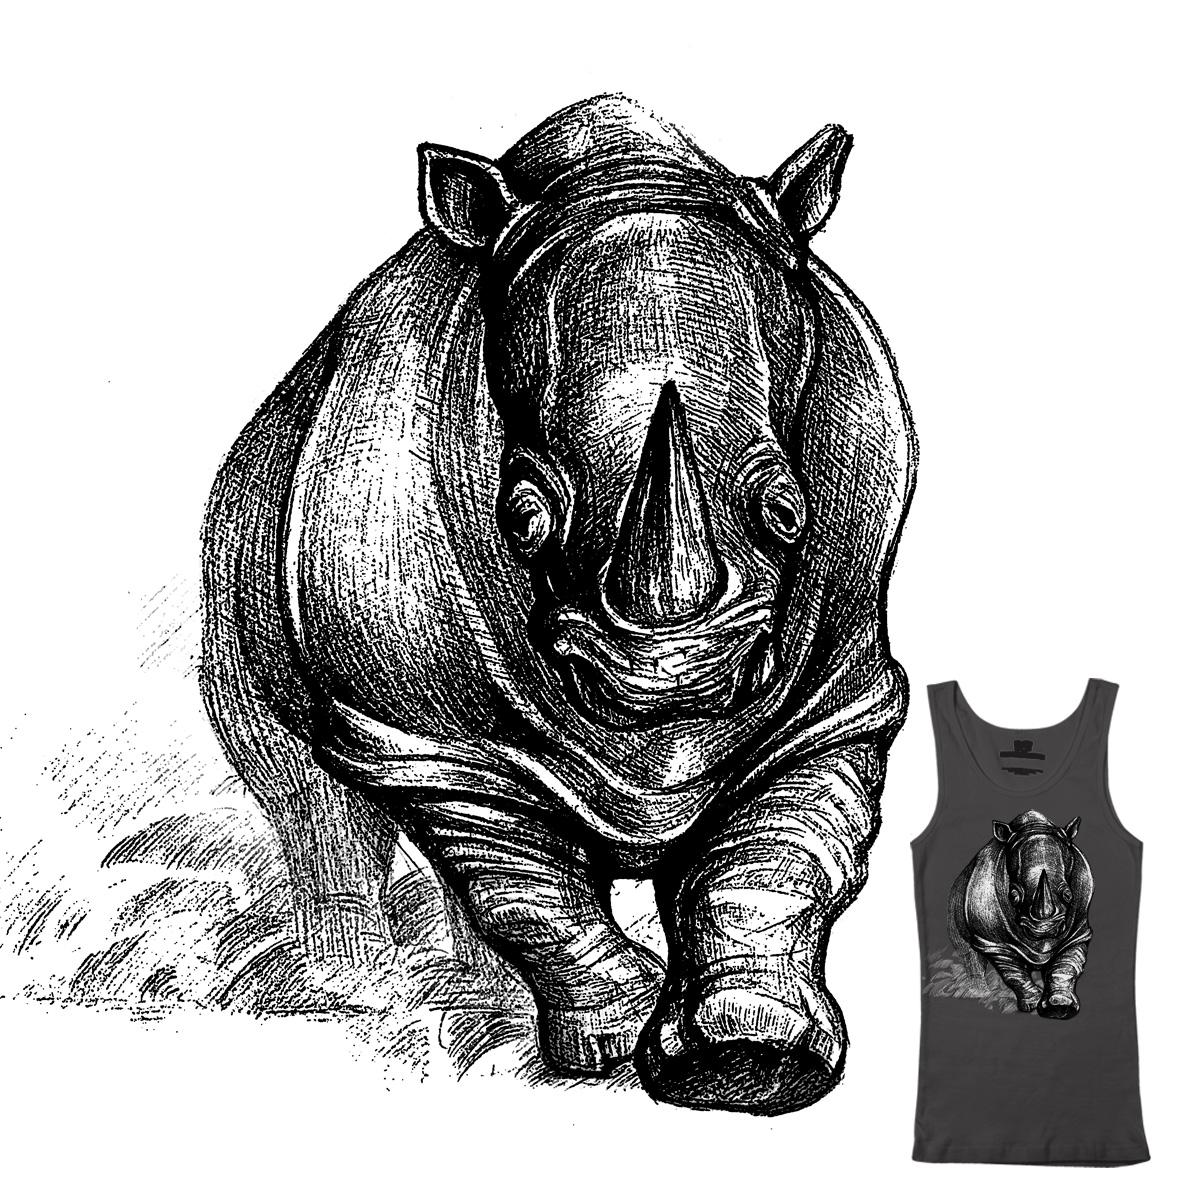 Rhino by newscale on Threadless